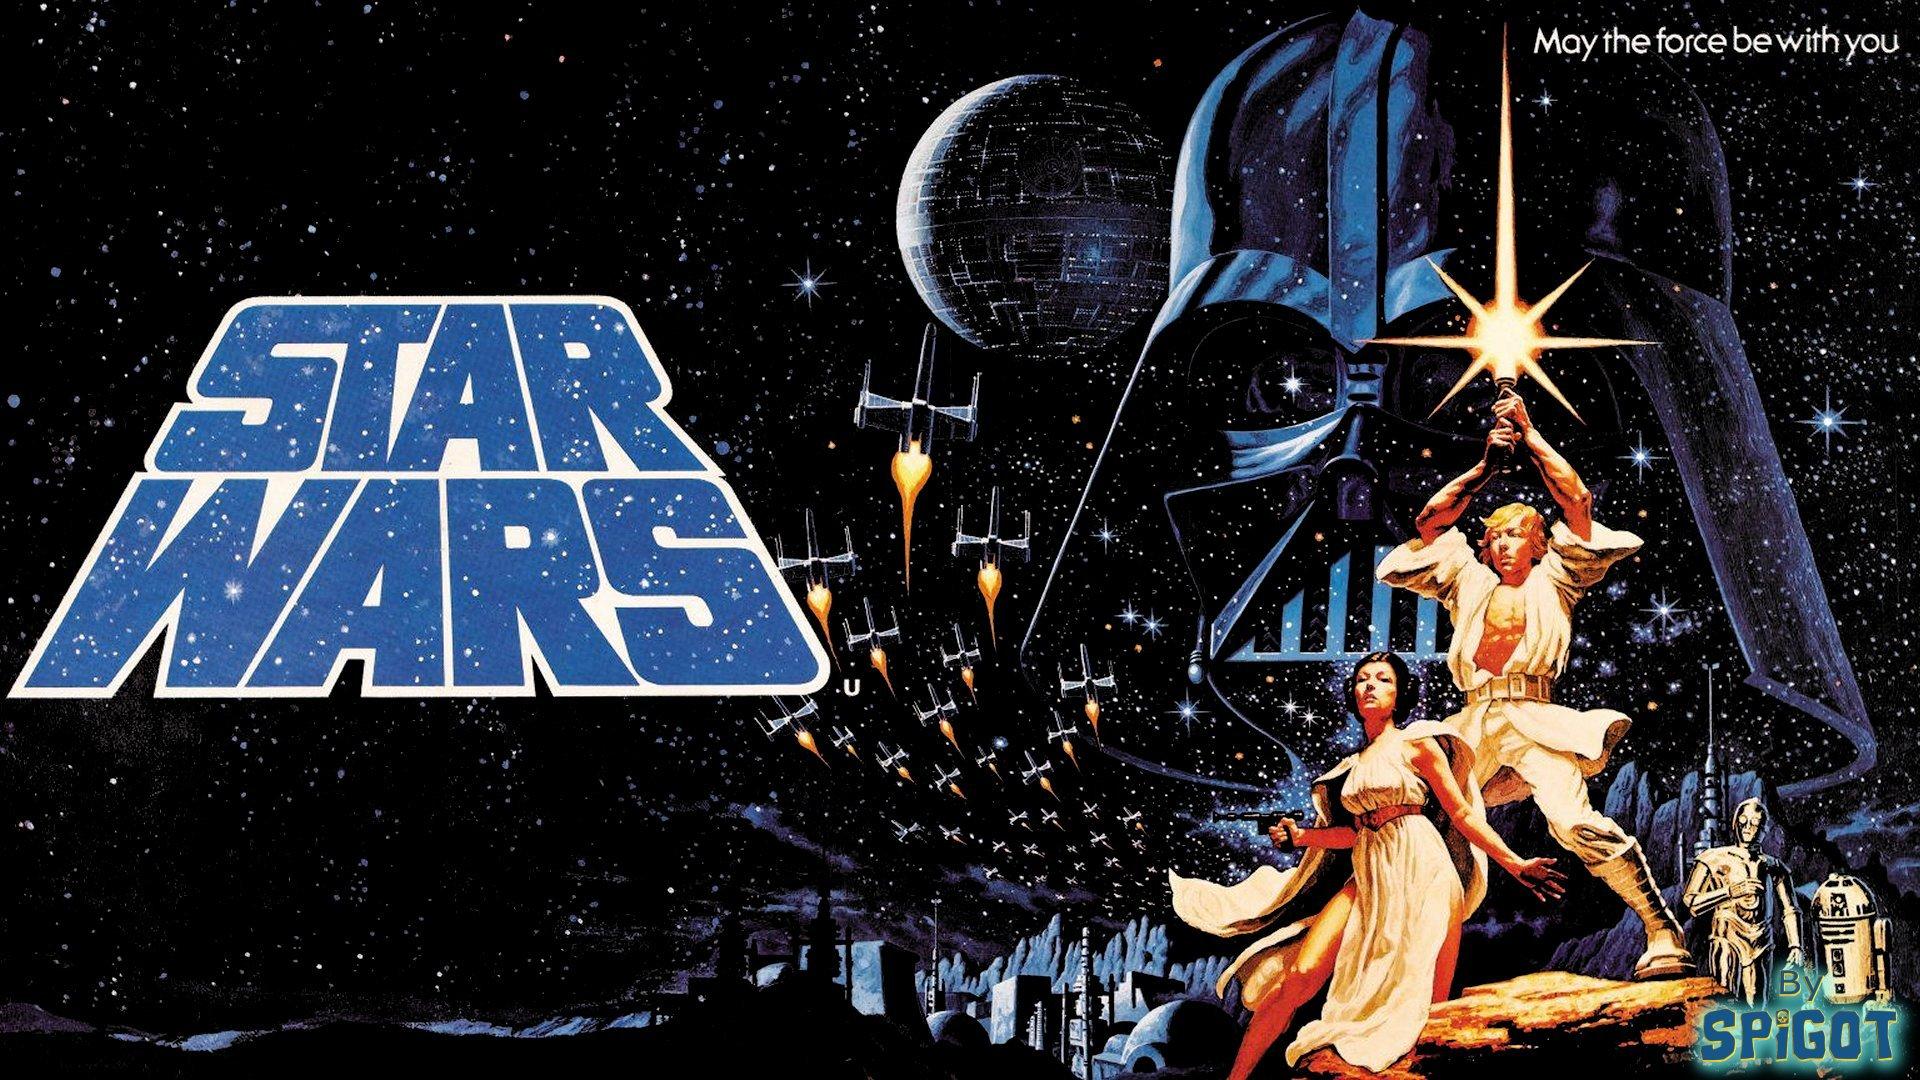 Fuentes de Informacin   Fondos de pantalla de Star Wars HD 1920x1080